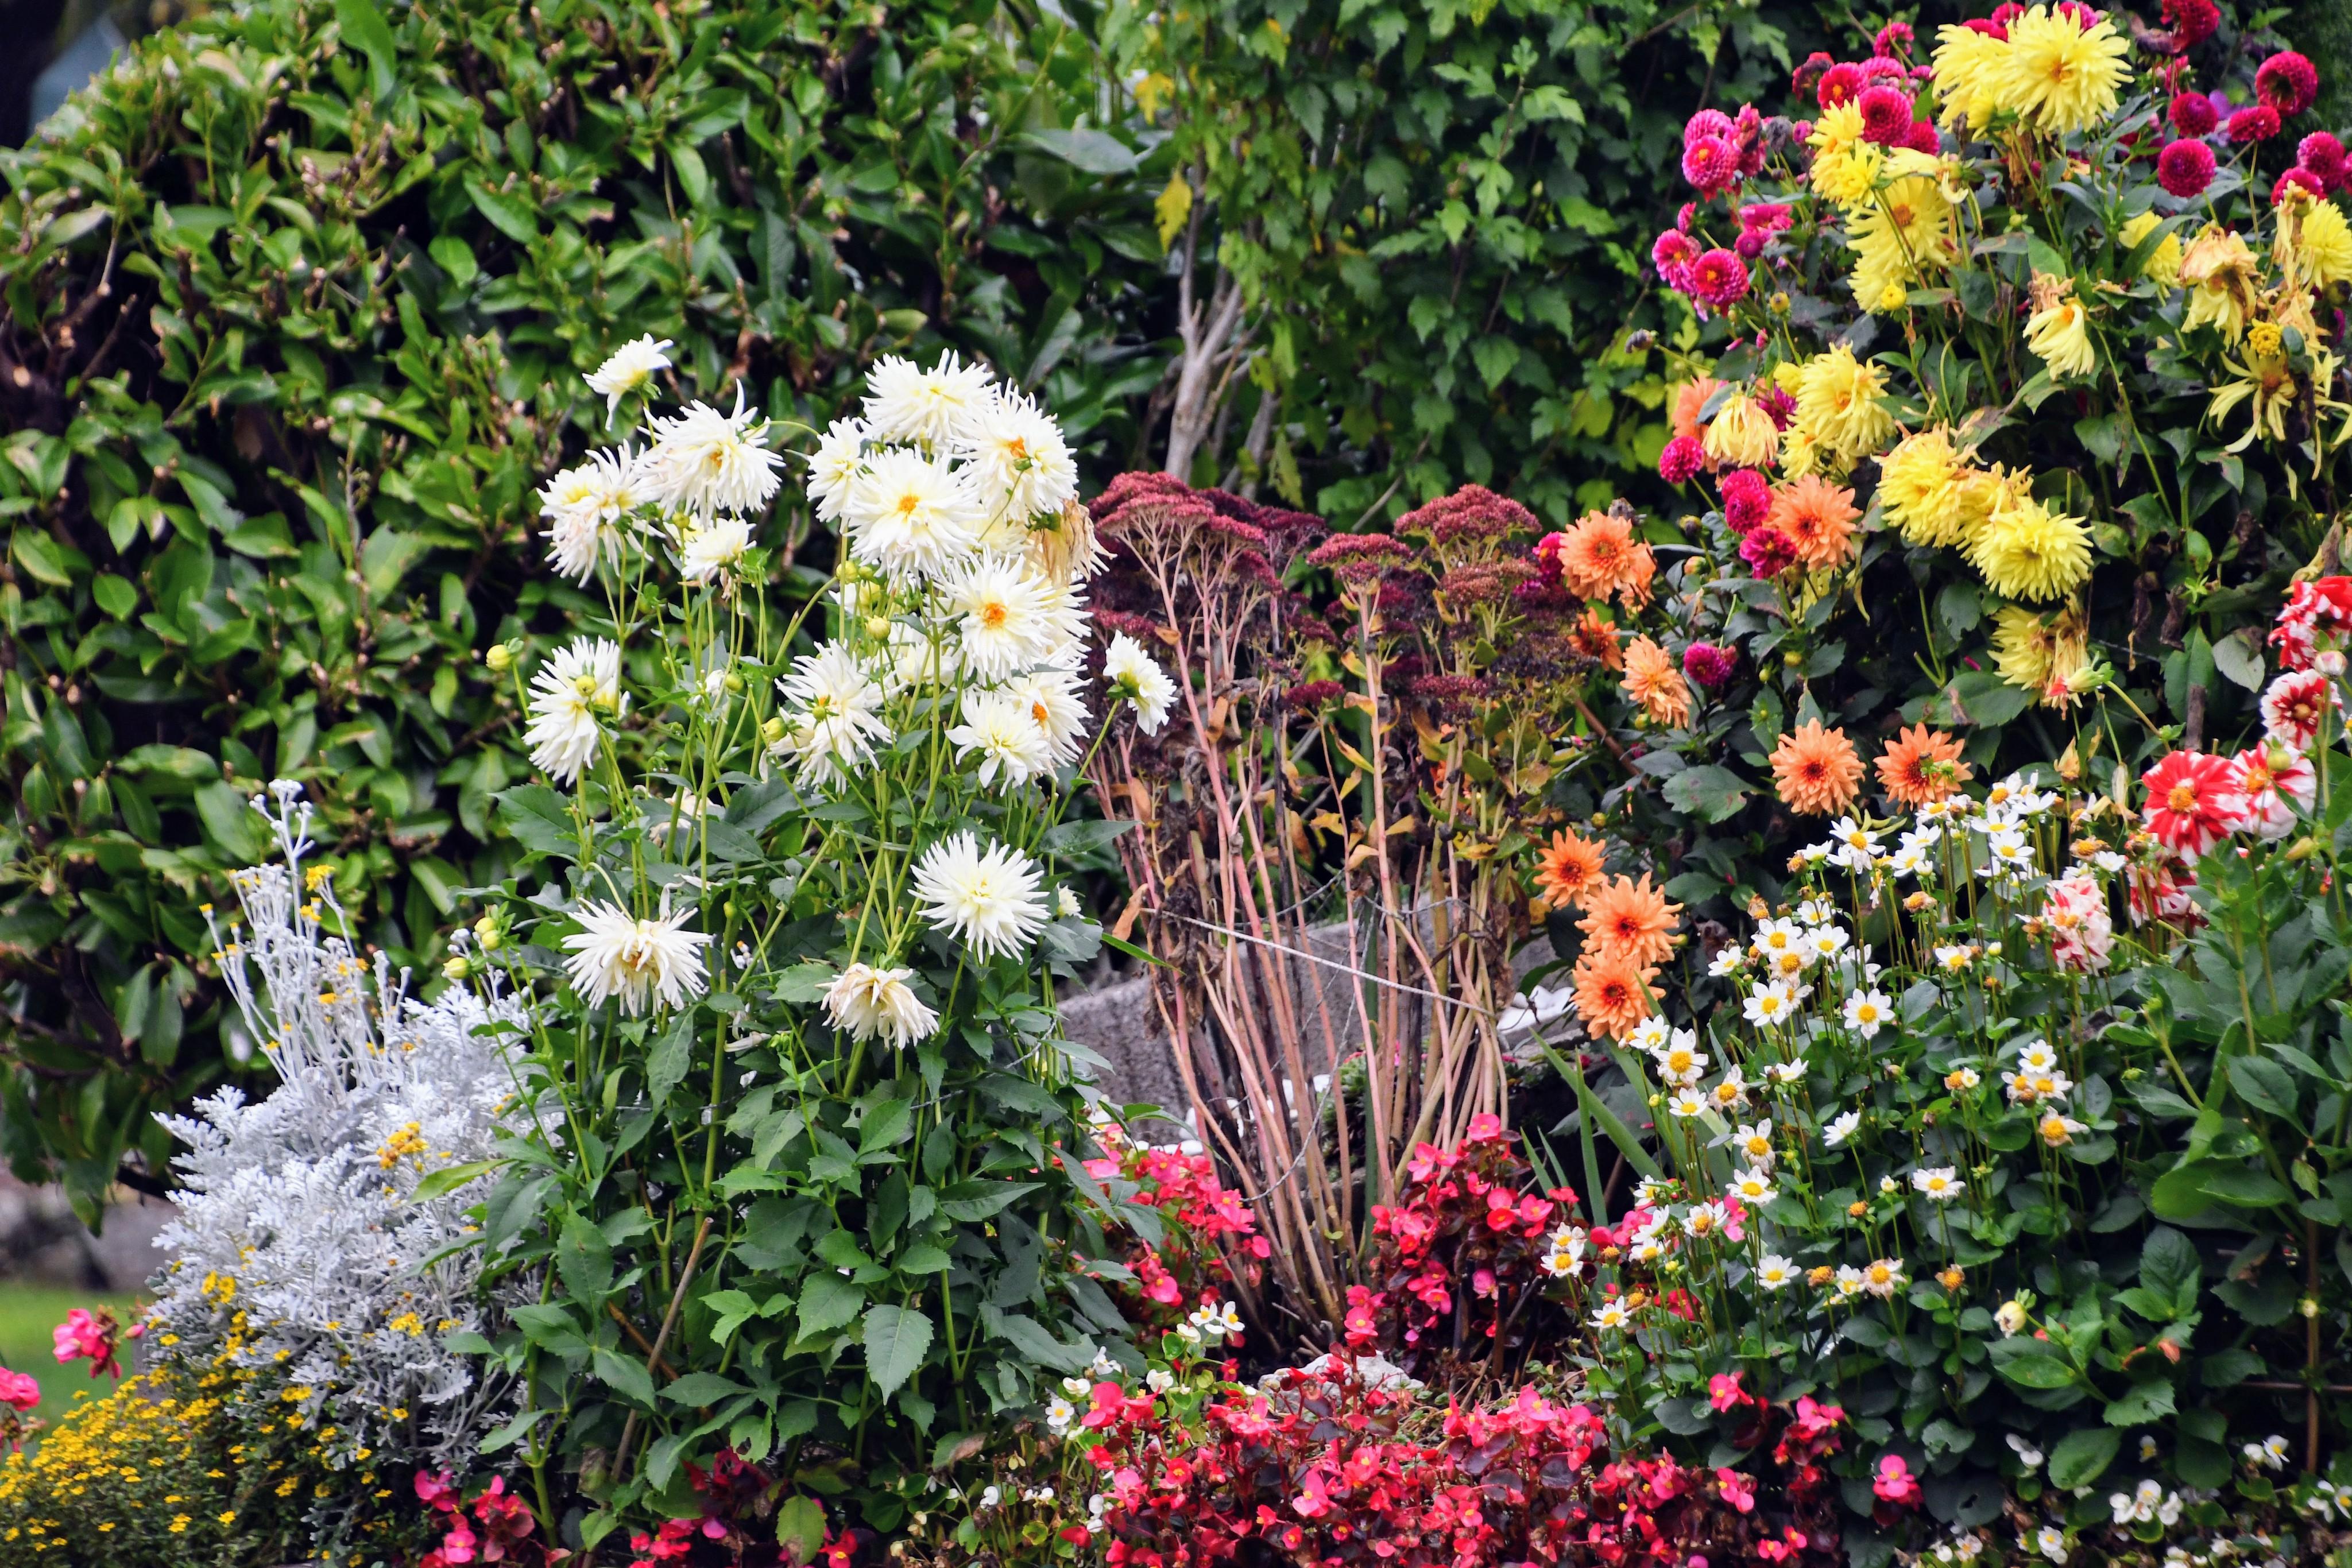 dahlia-chrysanthemum-and-autumn-flowerbed-20.10-1